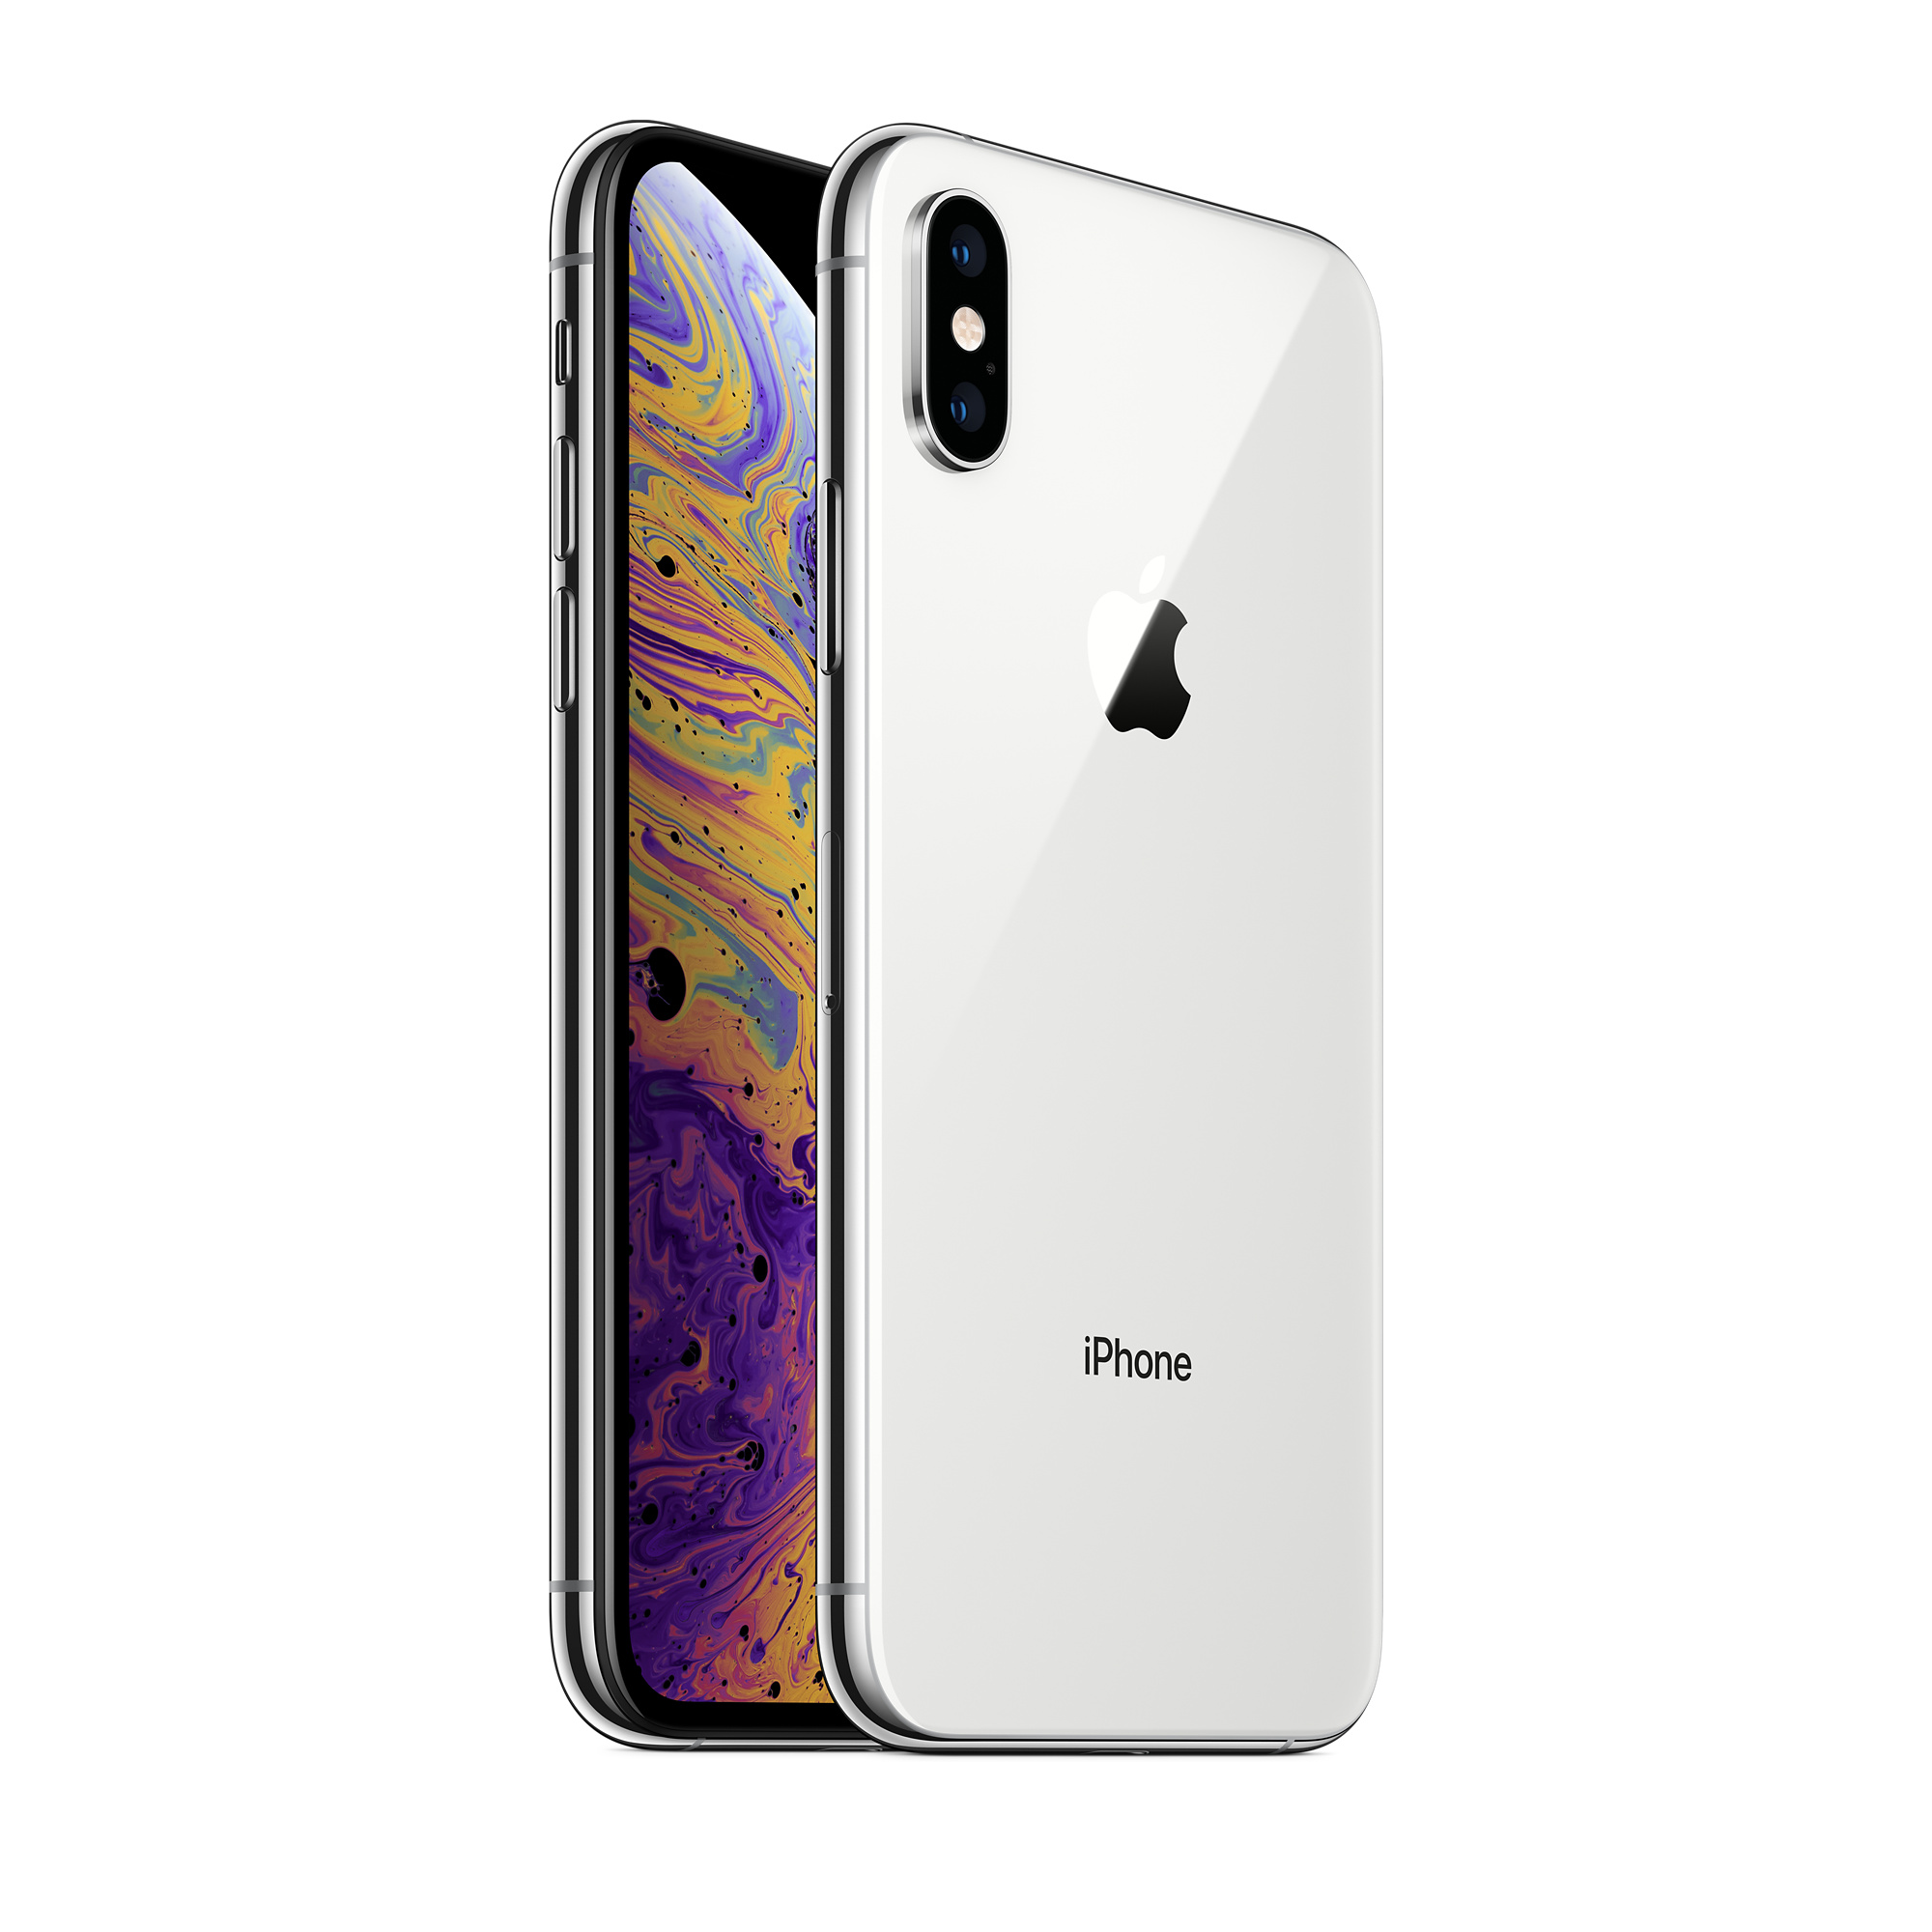 Refurbished iPhone XS 64GB - Silver (Unlocked) - Apple